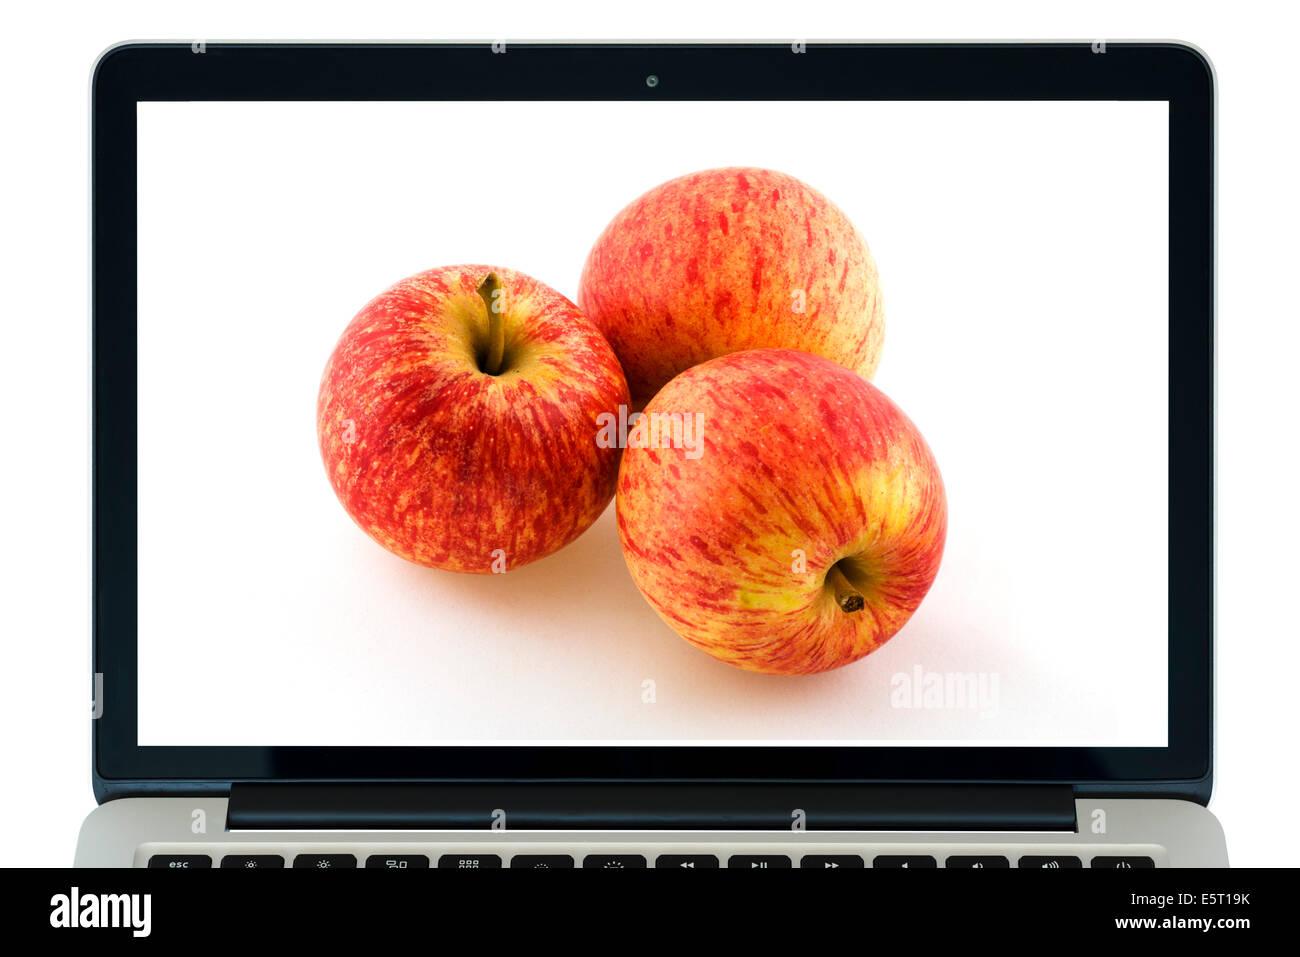 Apple MacBook Pro Retina 13' - Stock Image